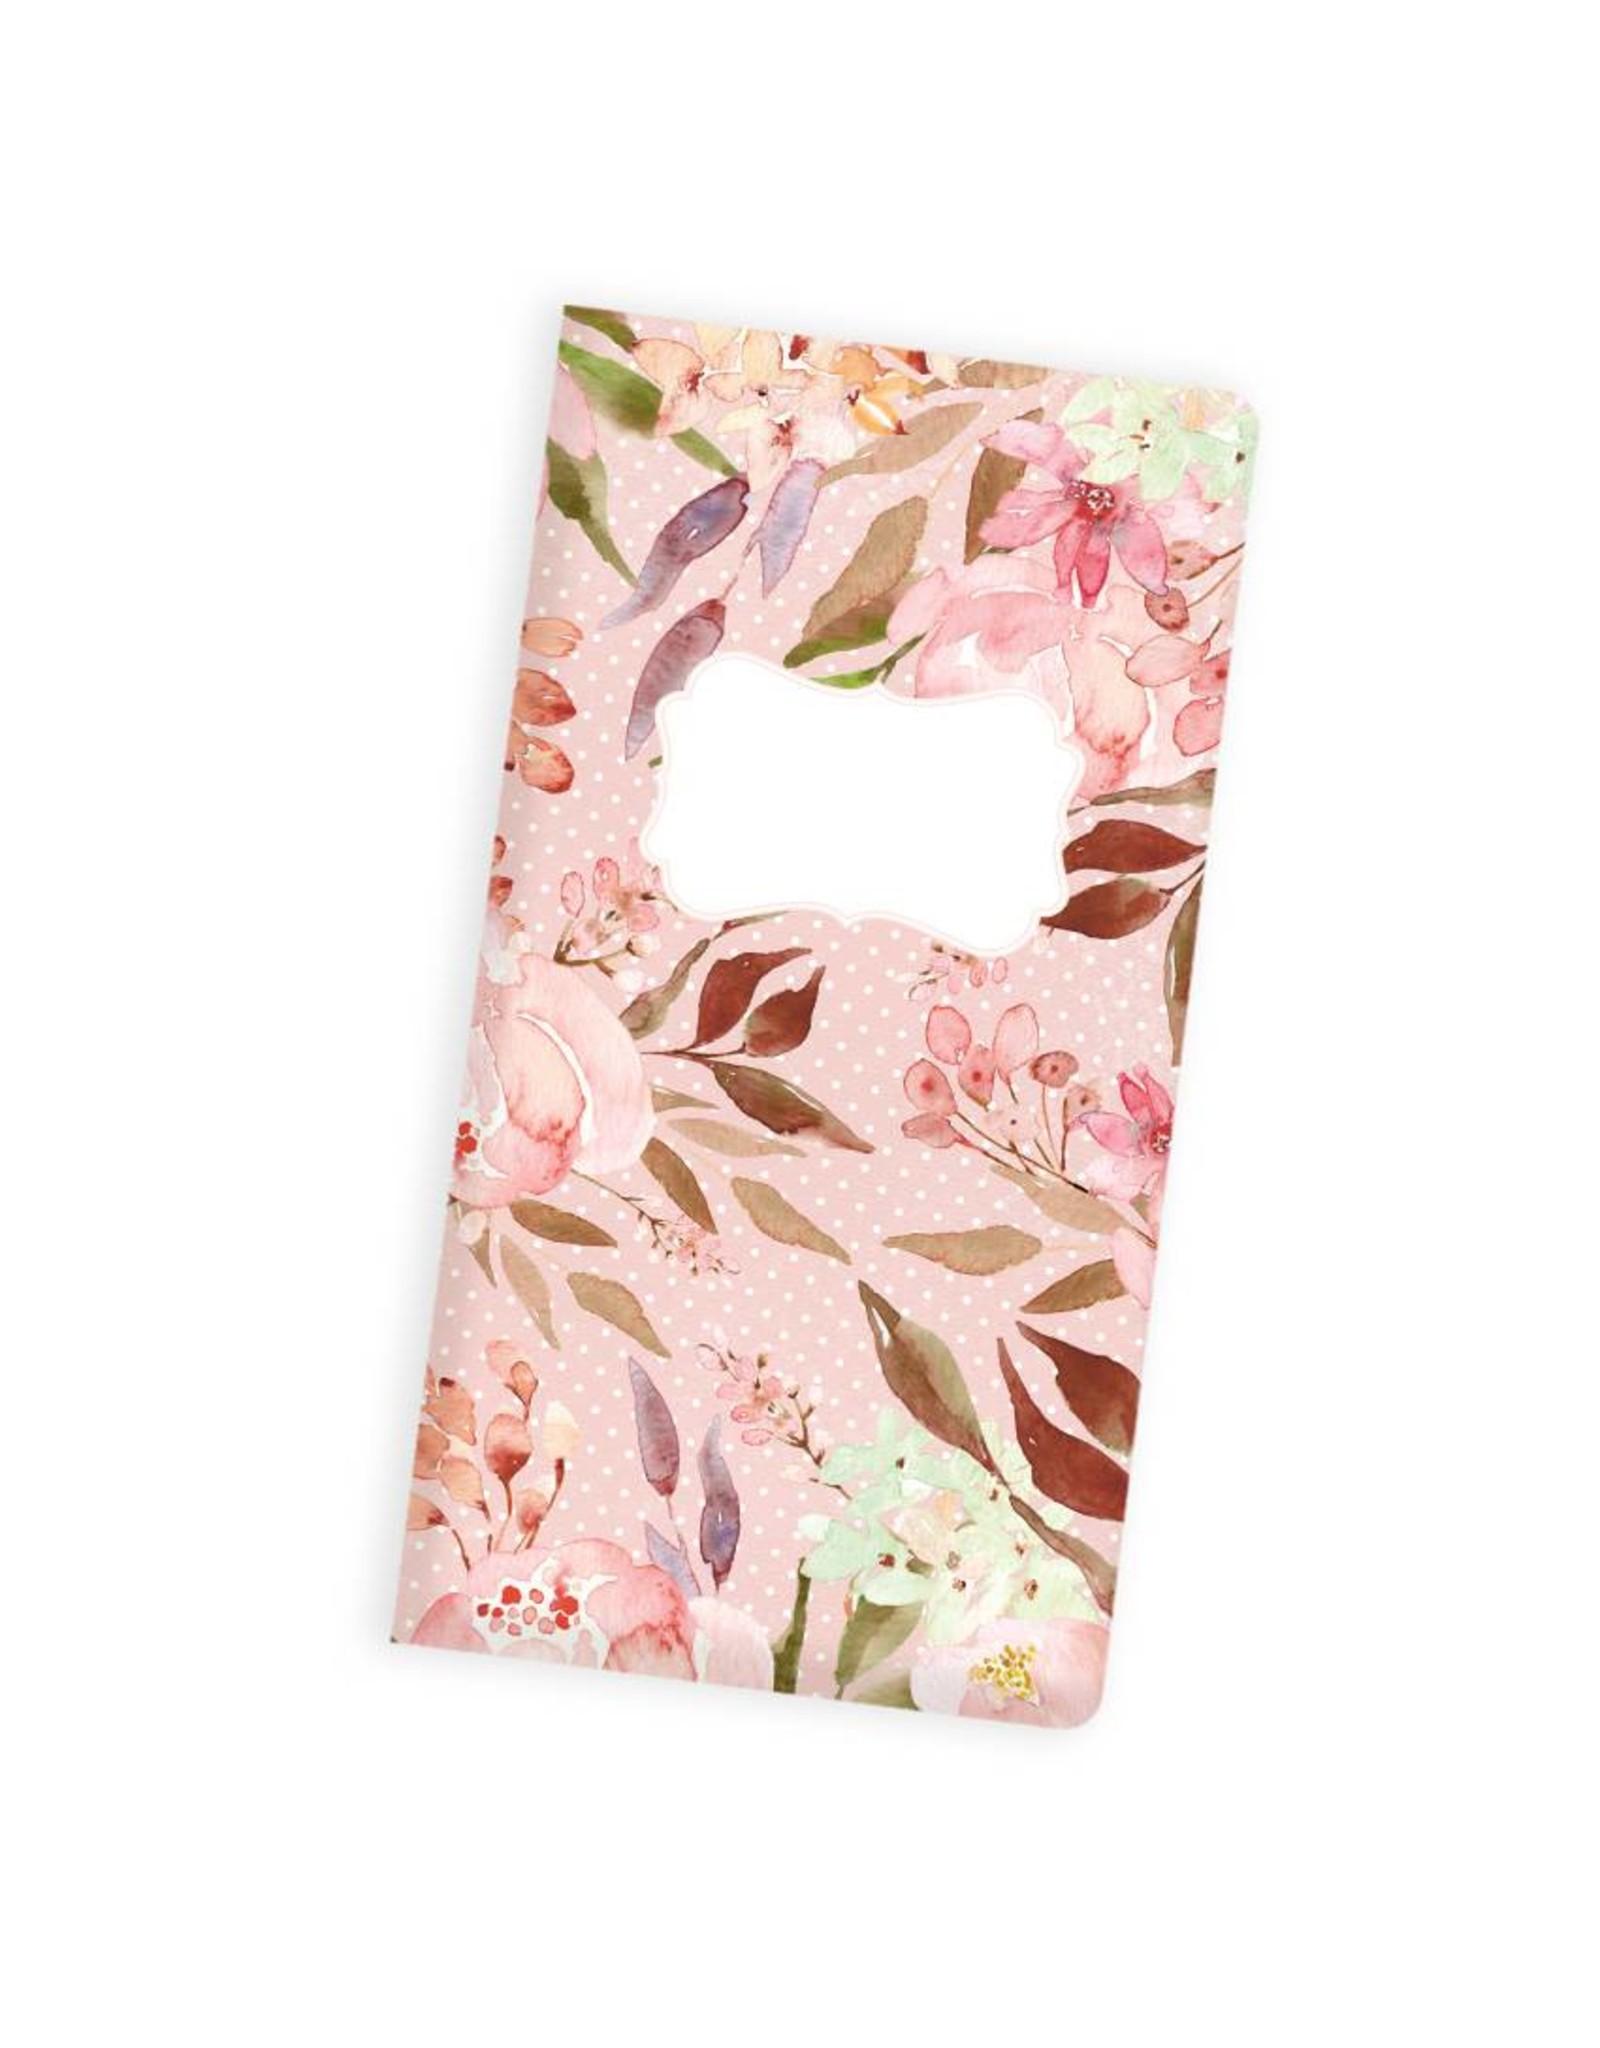 Piatek Piatek Travel journal Love in Bloom